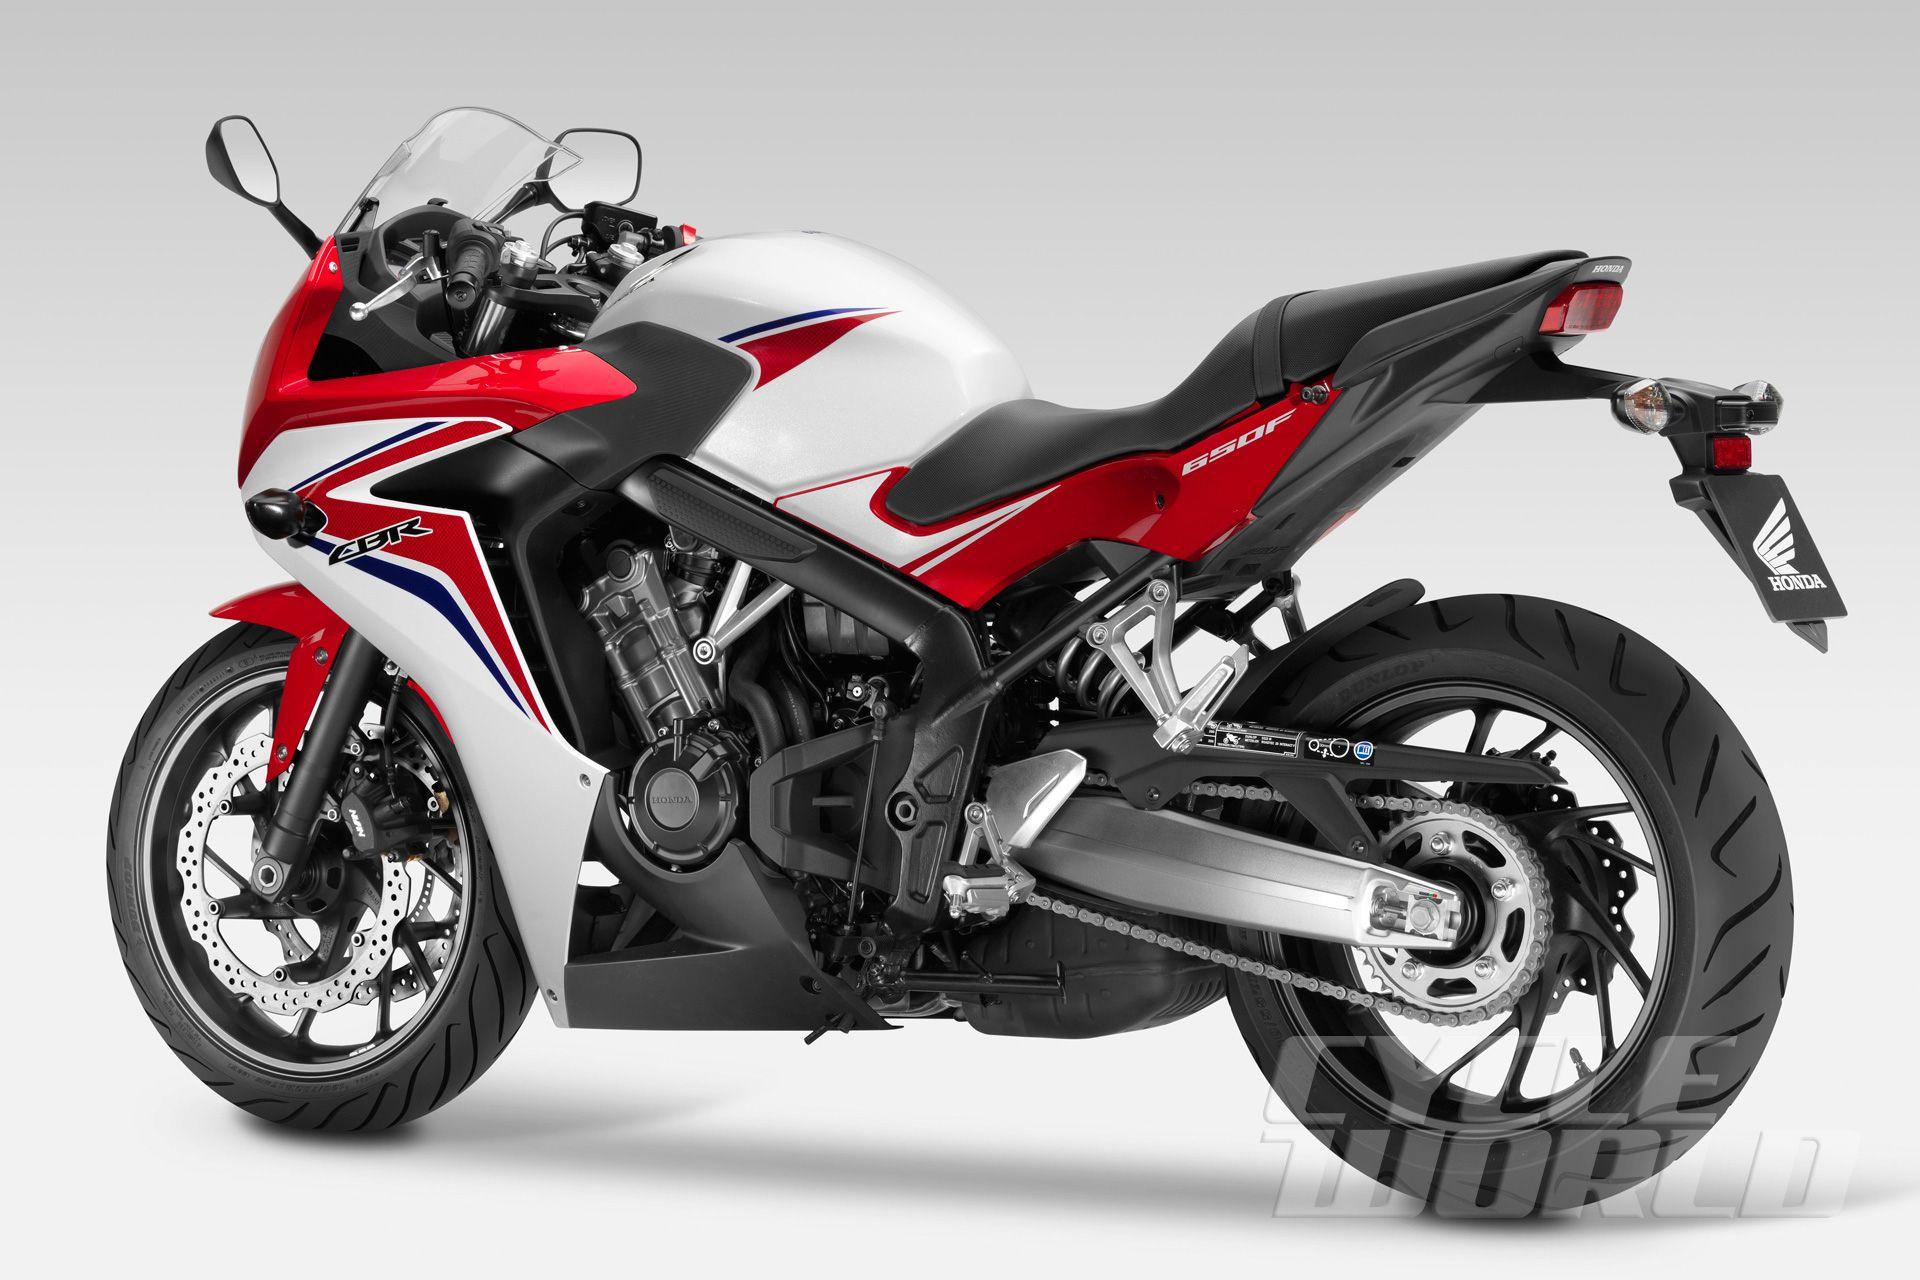 Cycle World 2014 Honda CBR650F First Look Motor